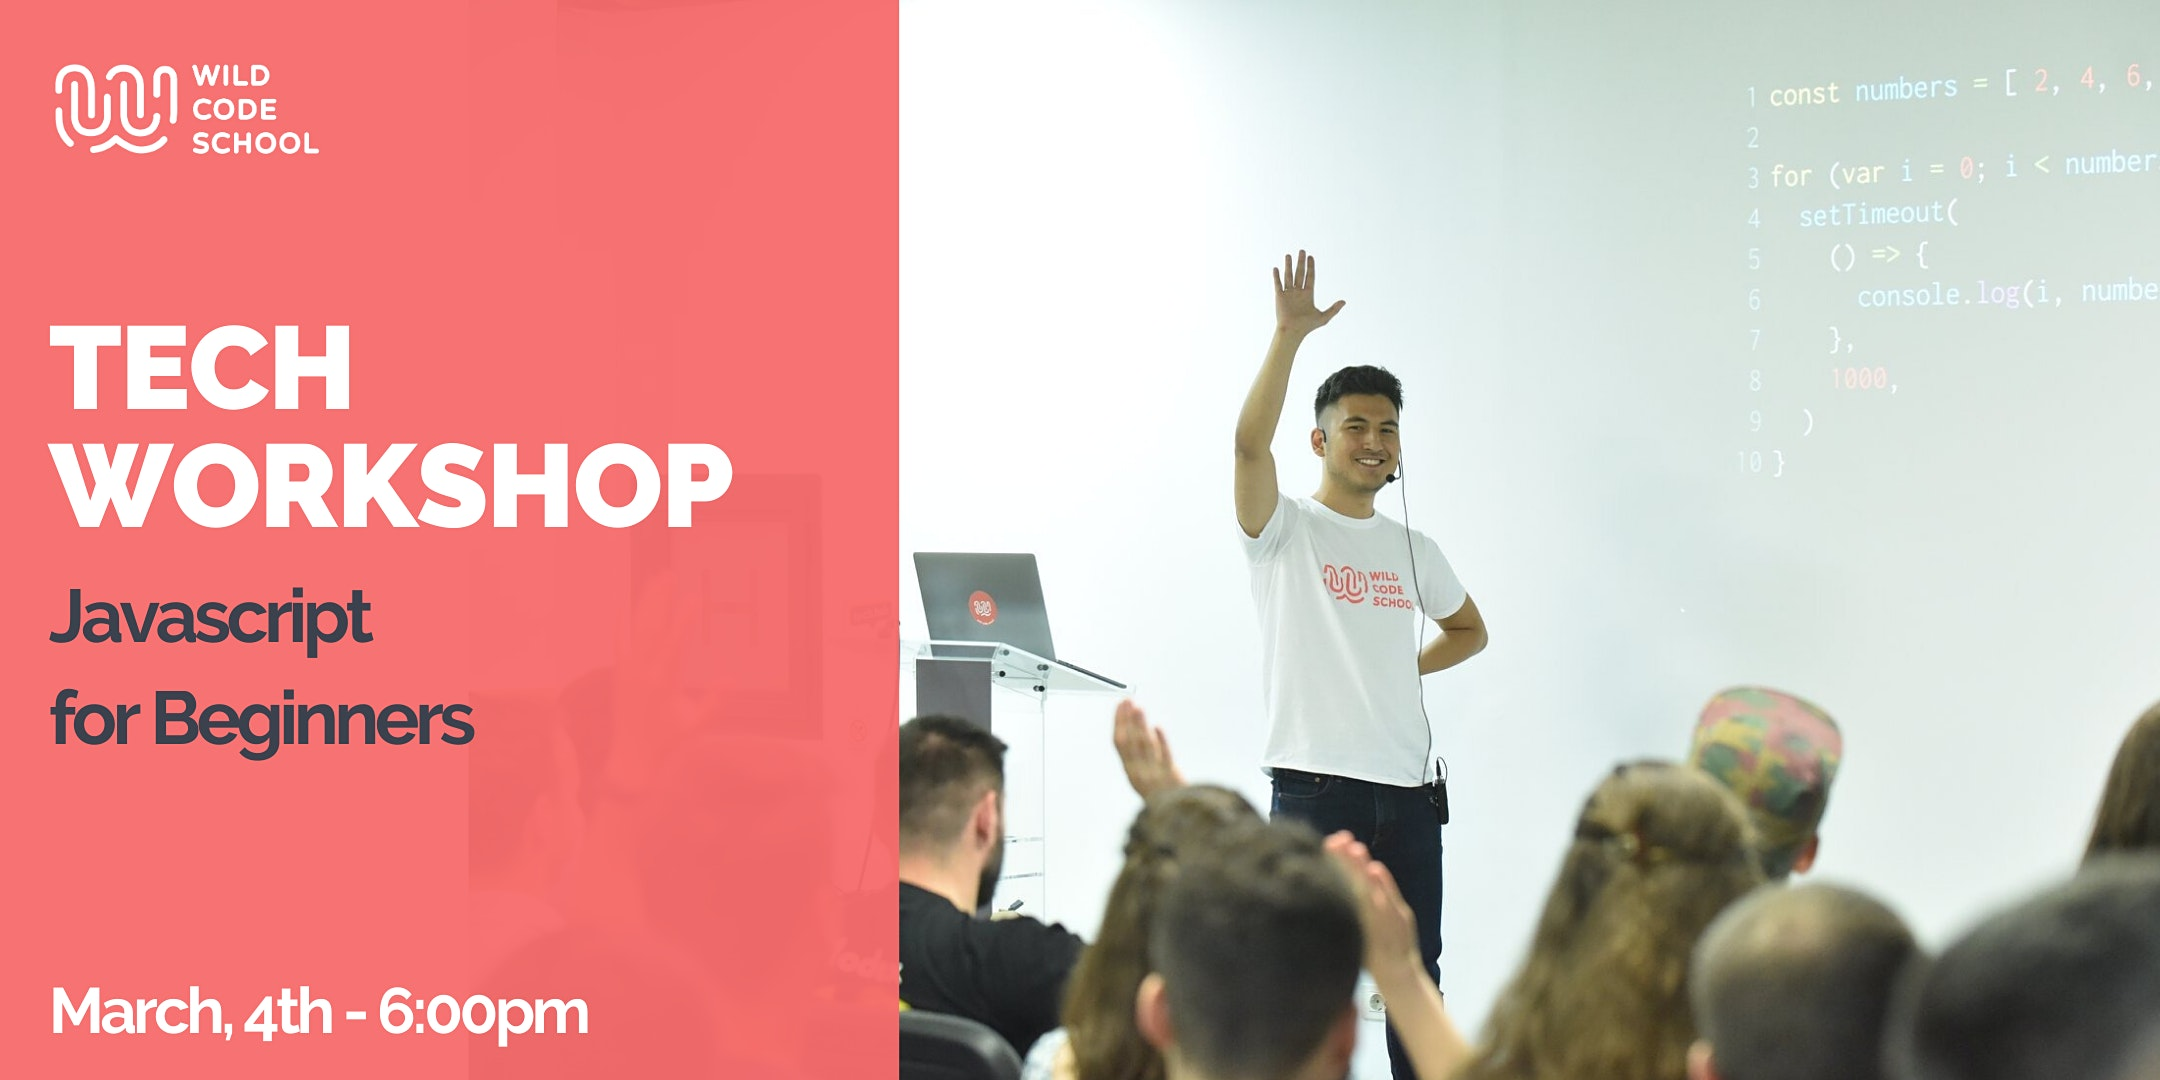 Tech Workshop - Introduction to Javascript